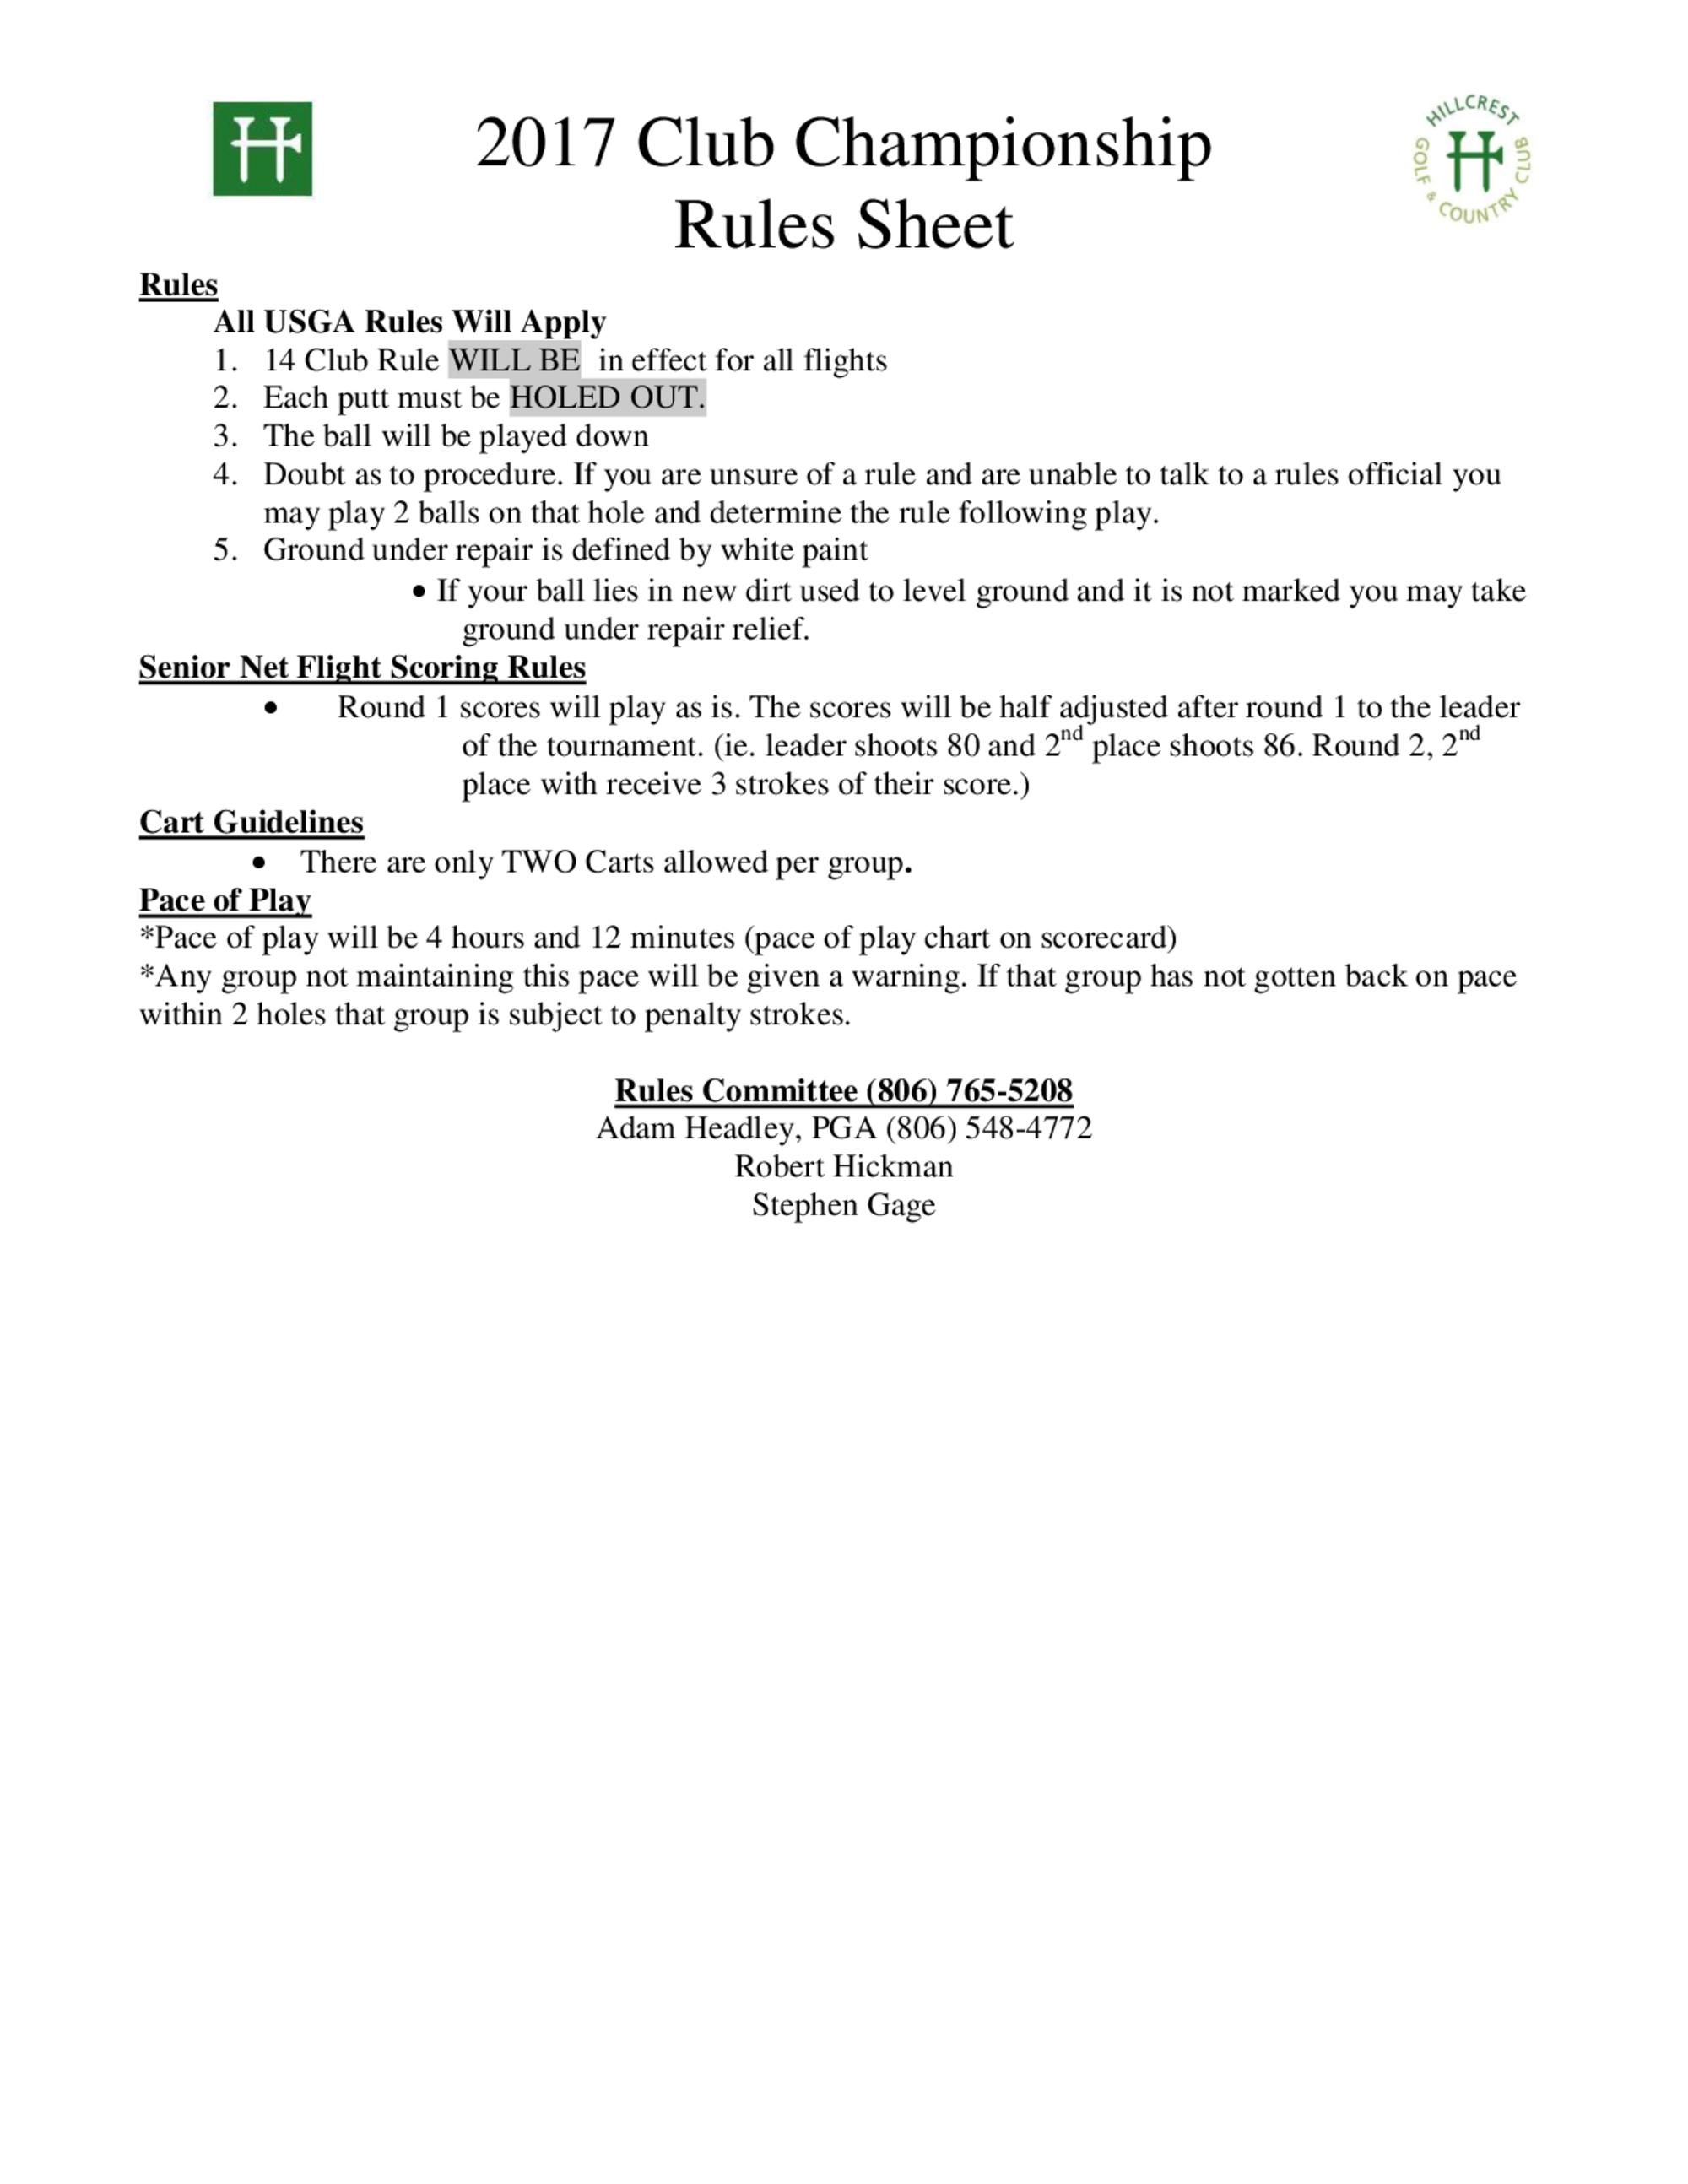 2017 club champ rules sheet 1